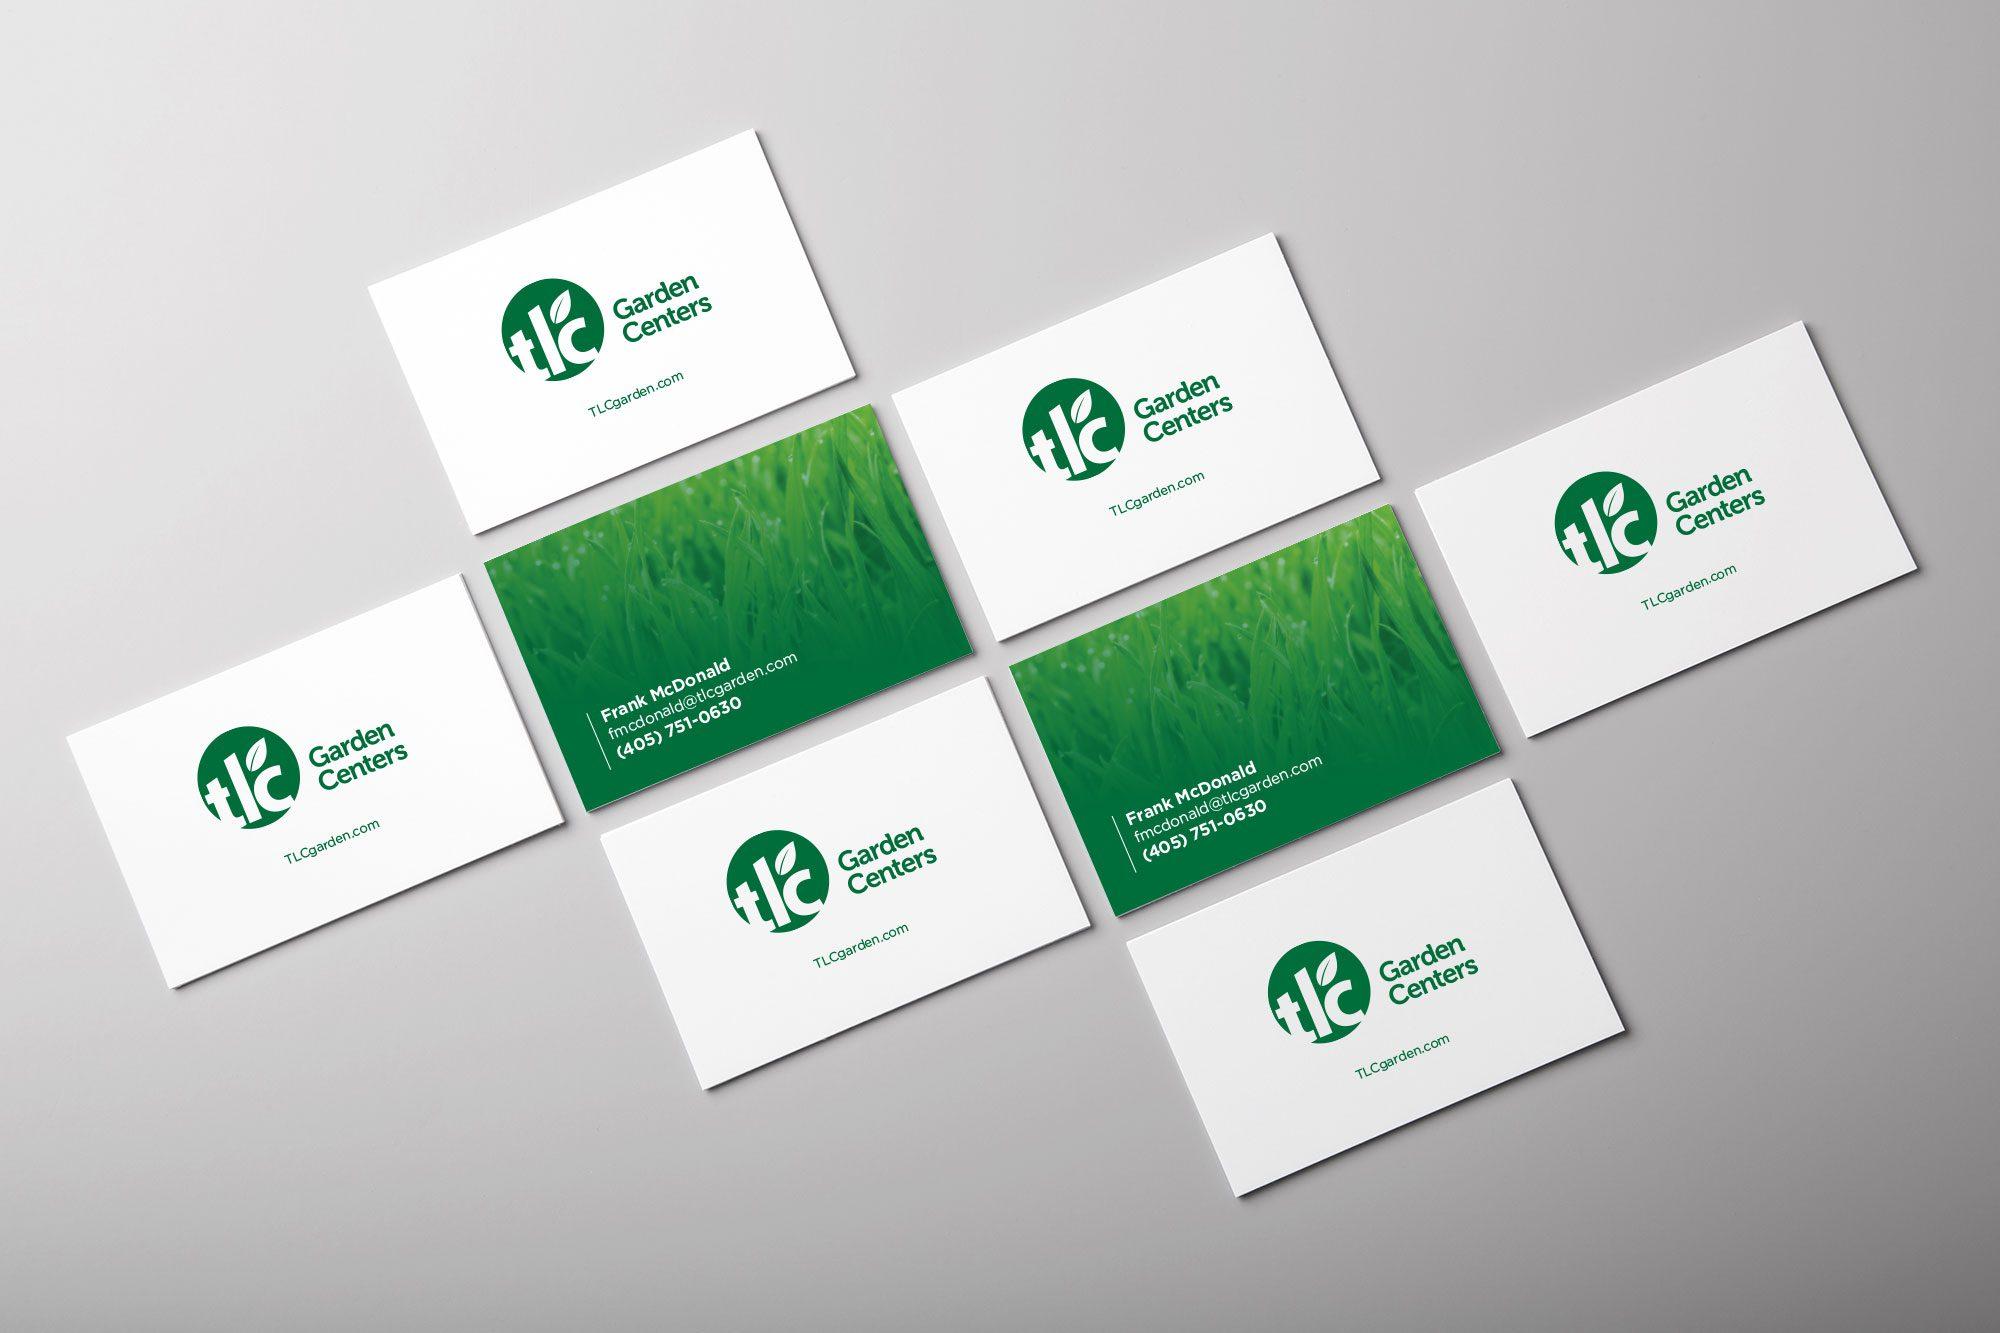 Logo Design Services   TLC Garden Centers   Liquid Media